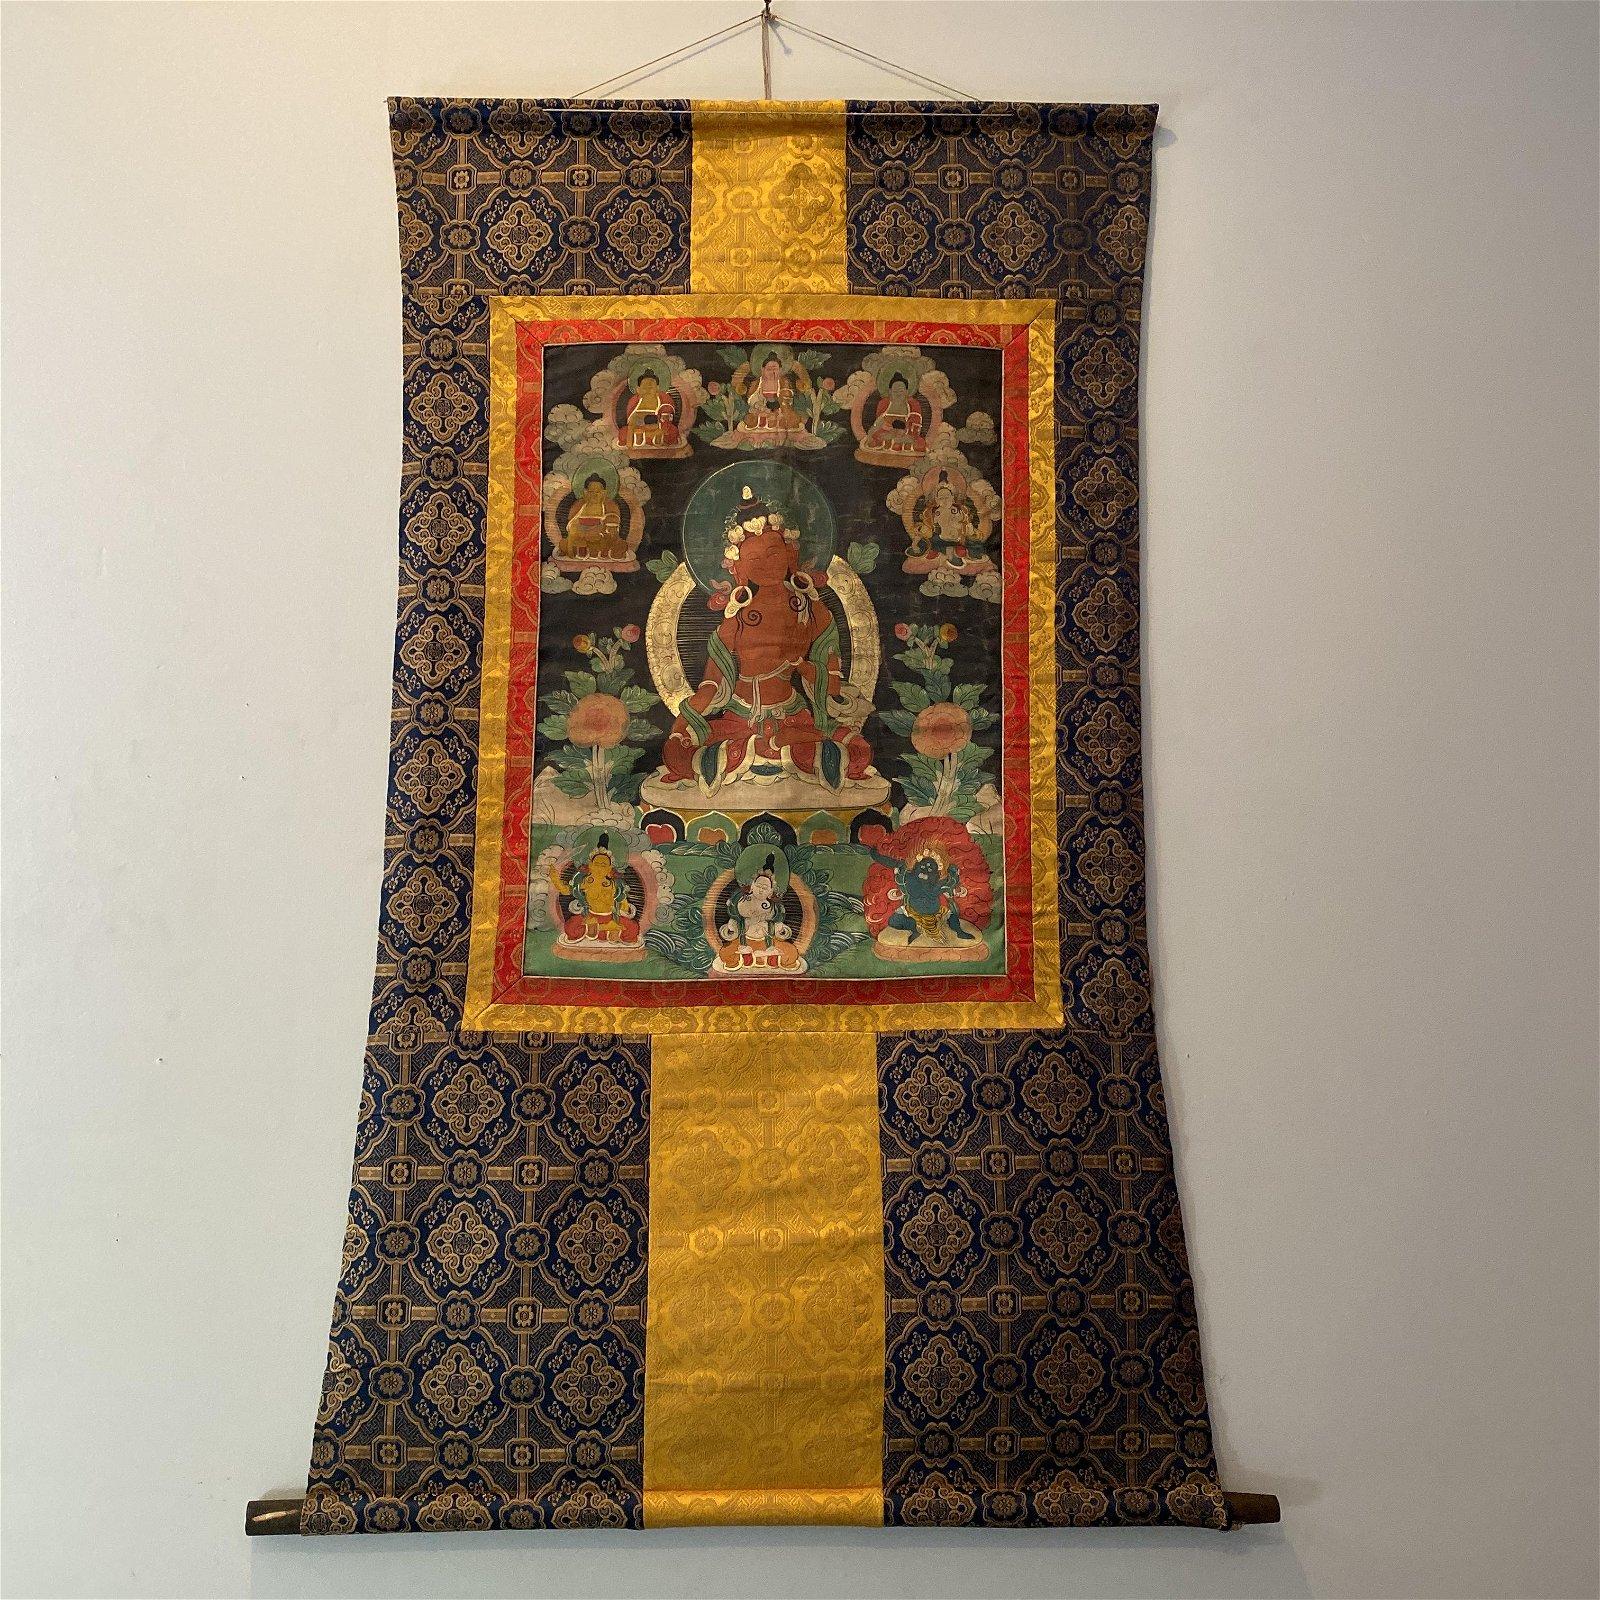 Chinese Tibetan Thangka Painting of Tara